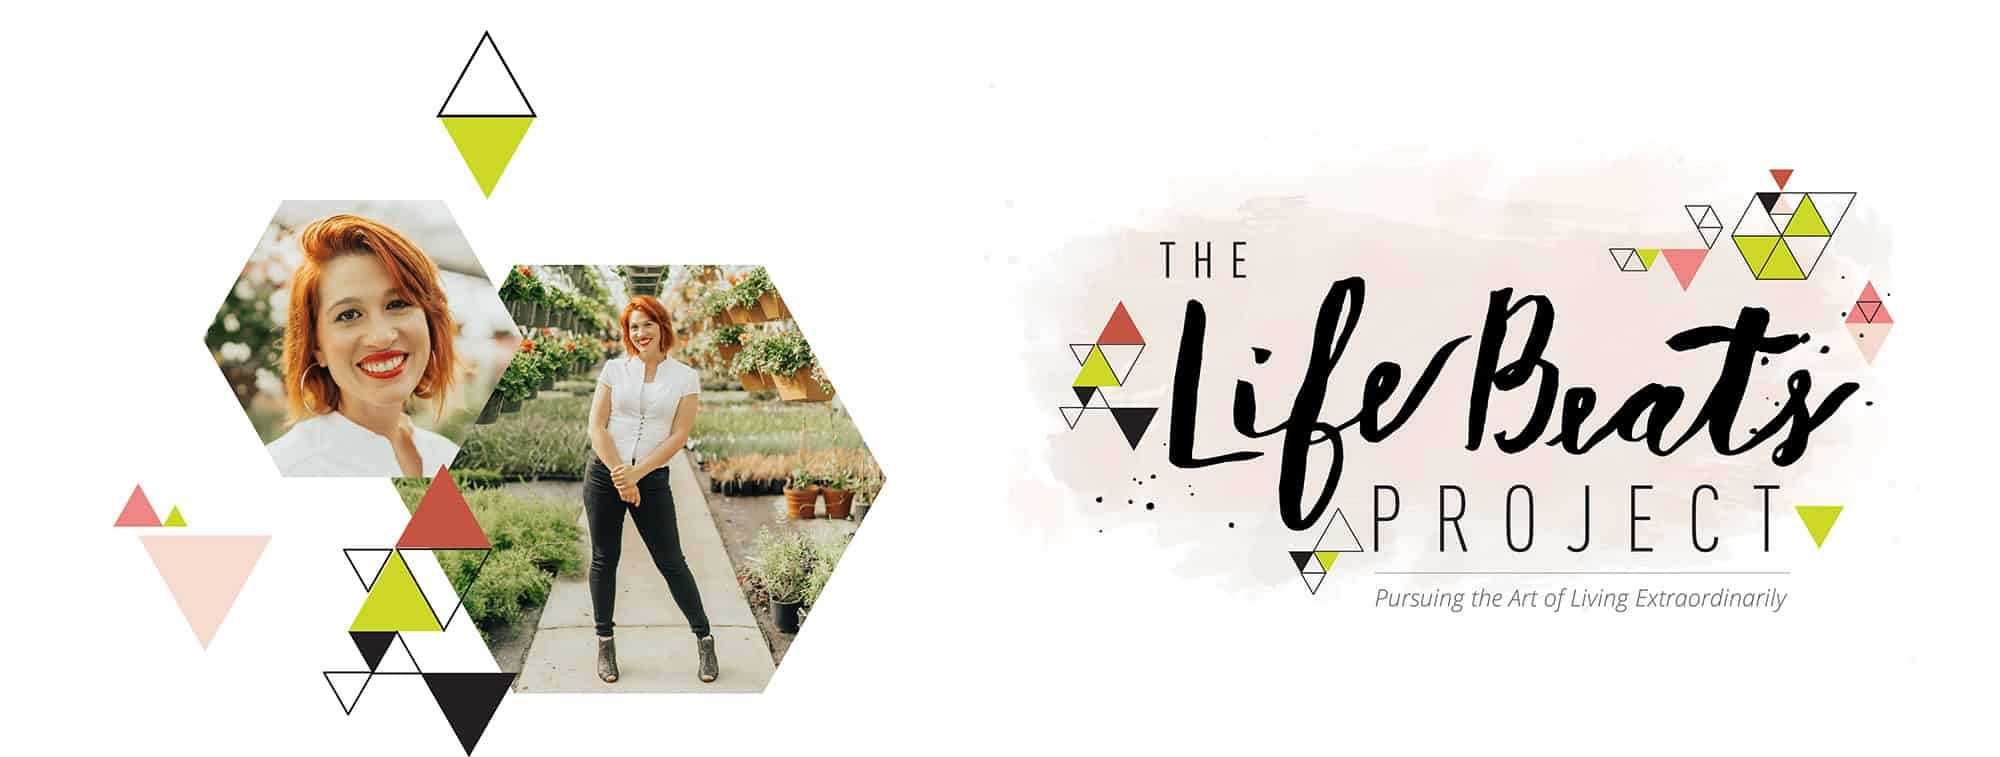 The LifeBeats Project Header